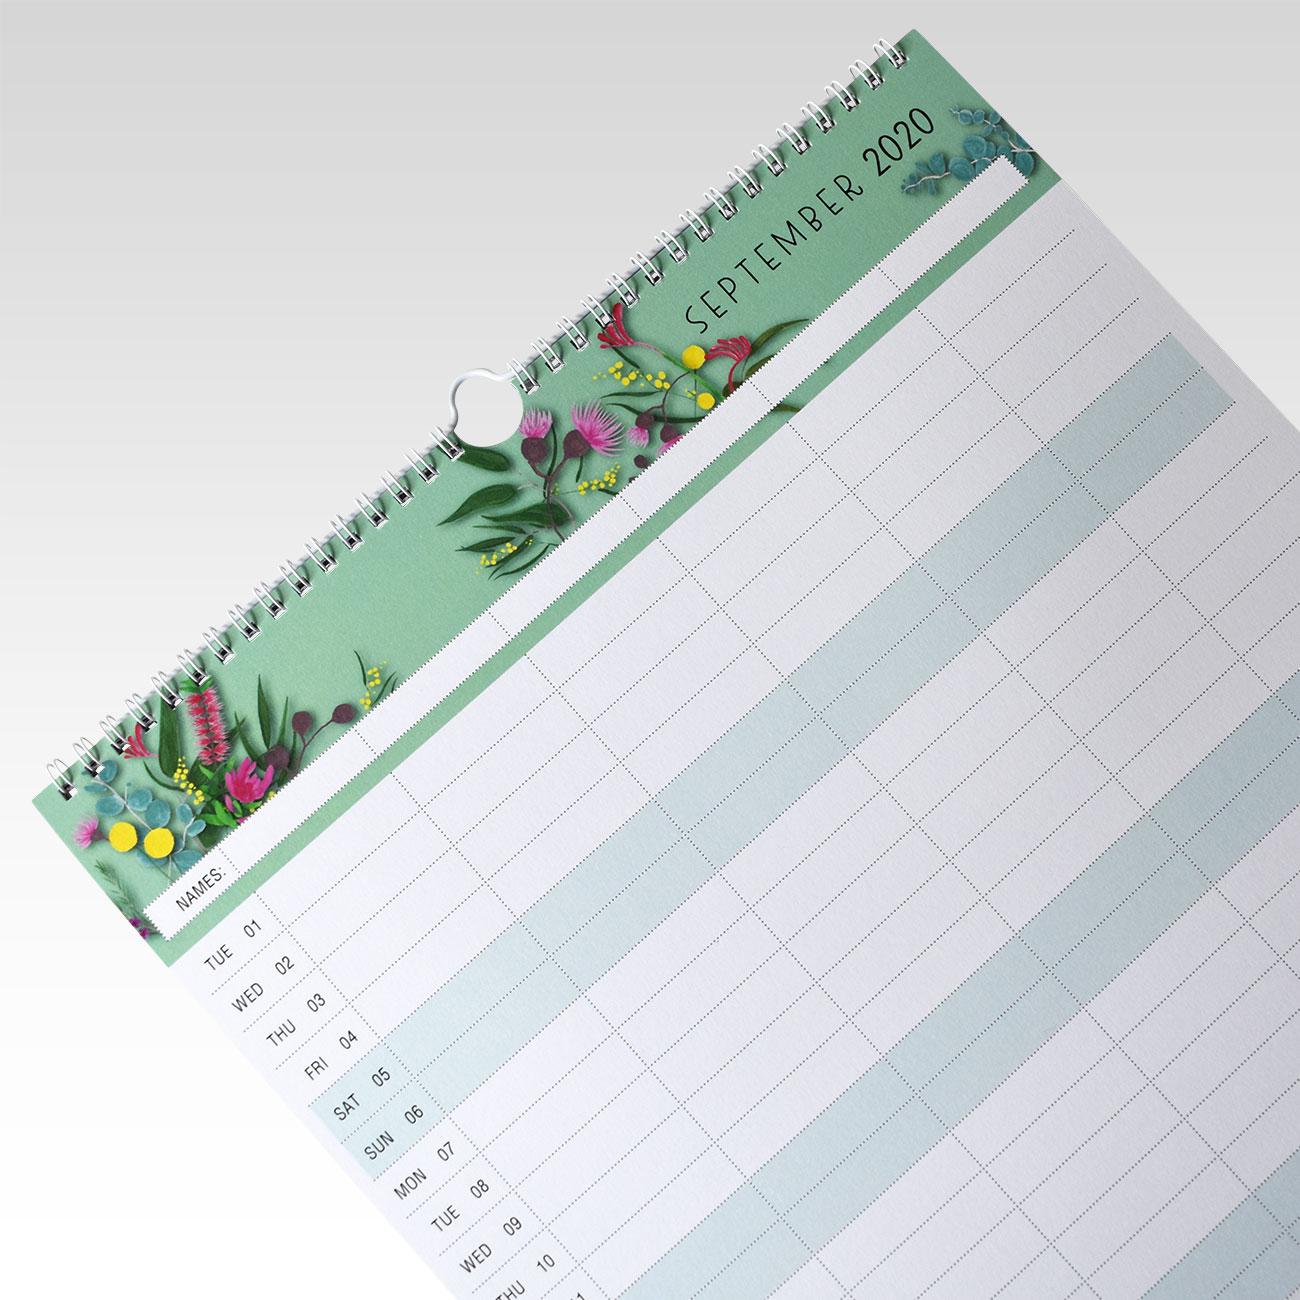 2020 Australian Icons Calendar For Australiana Souvenirs: 2020 Family Planner Calendar